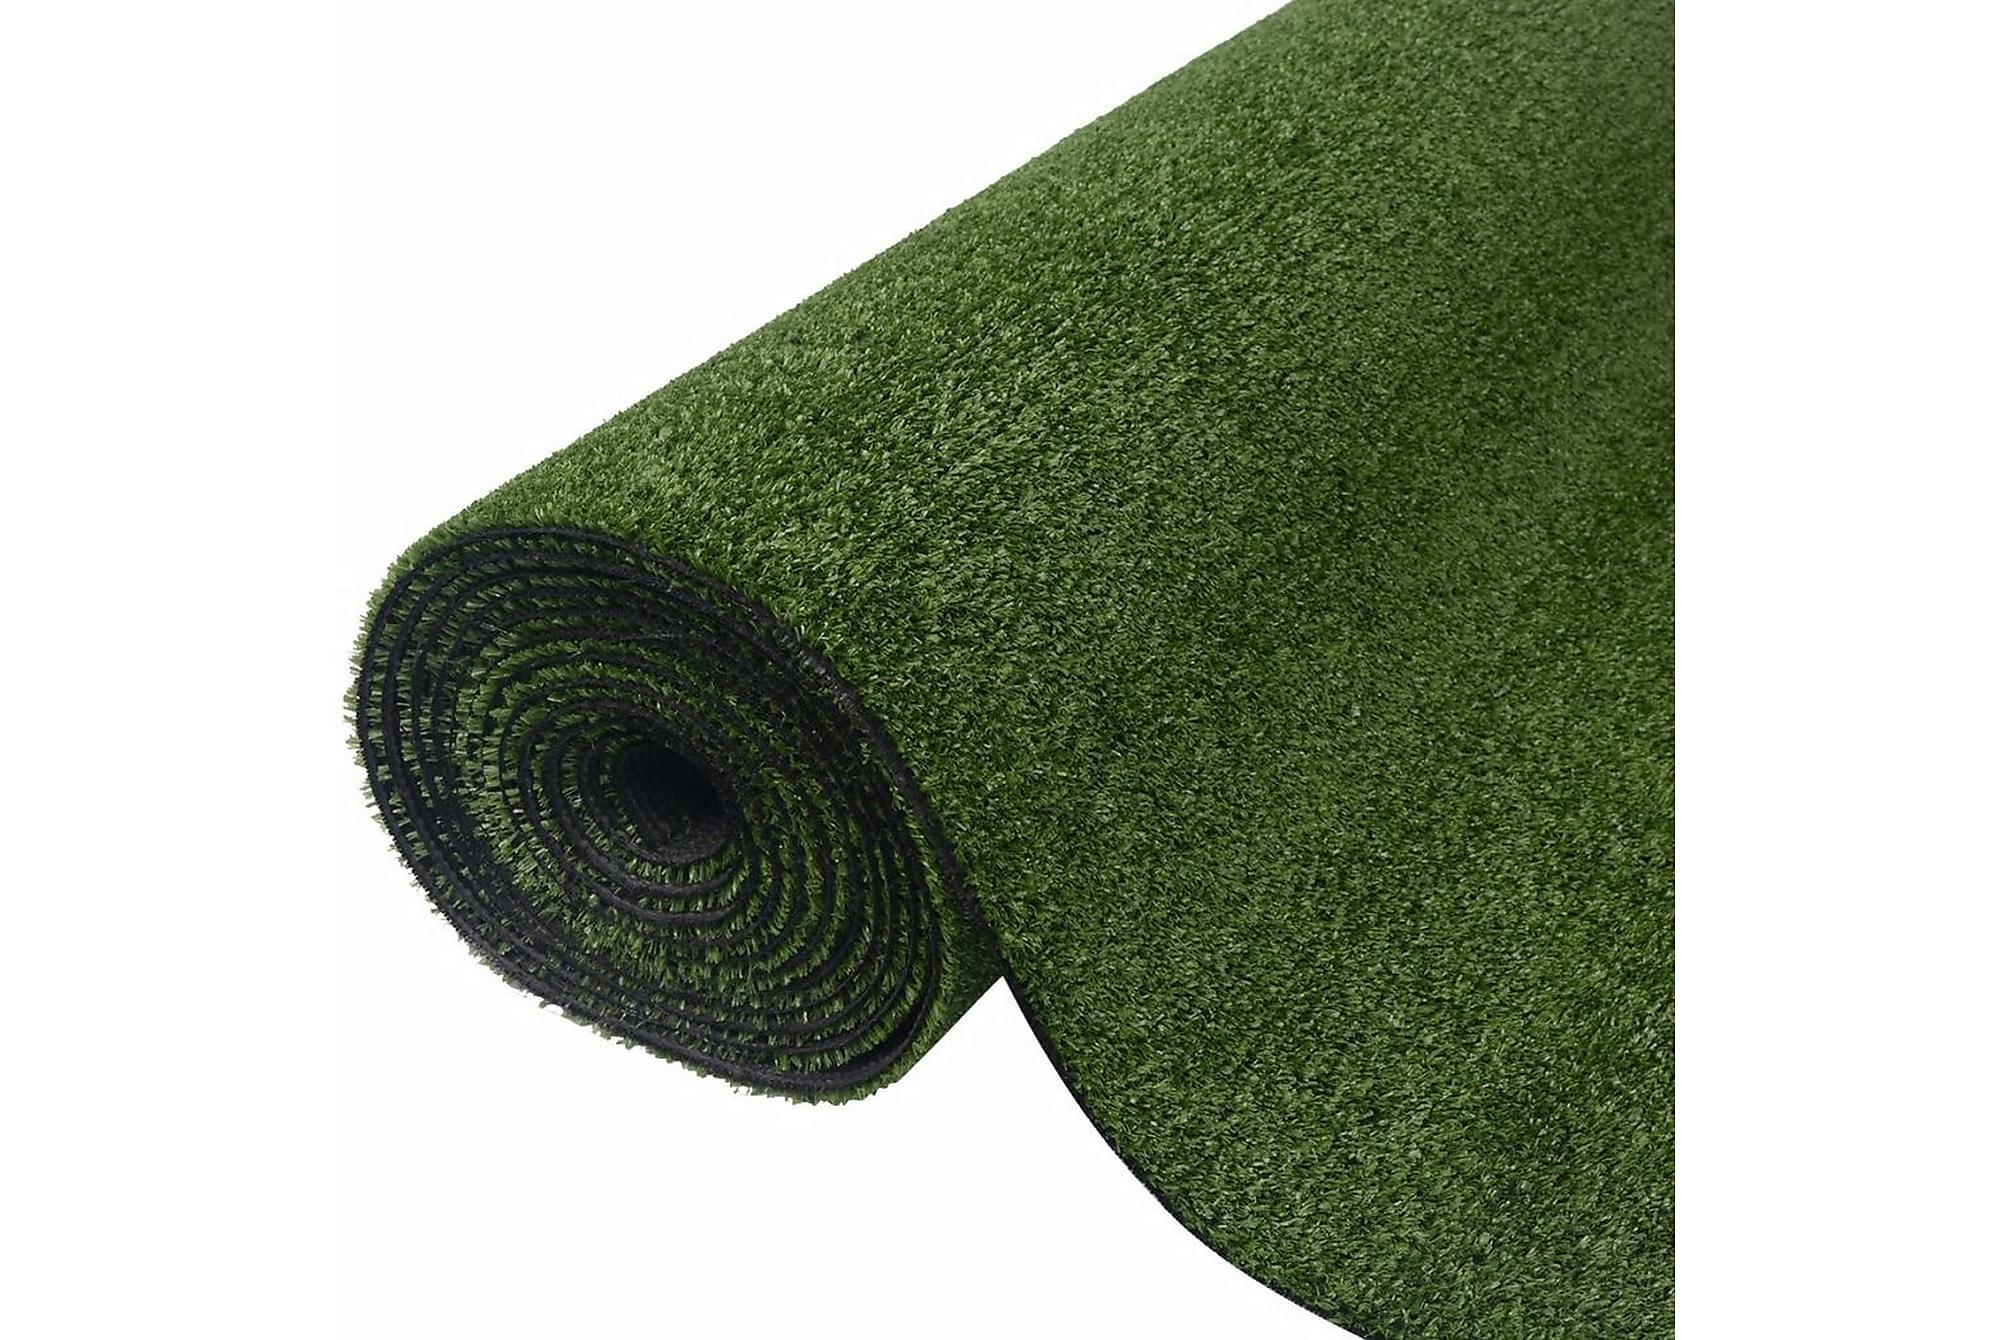 Konstgräsmatta 1×25 m/7-9 mm grön